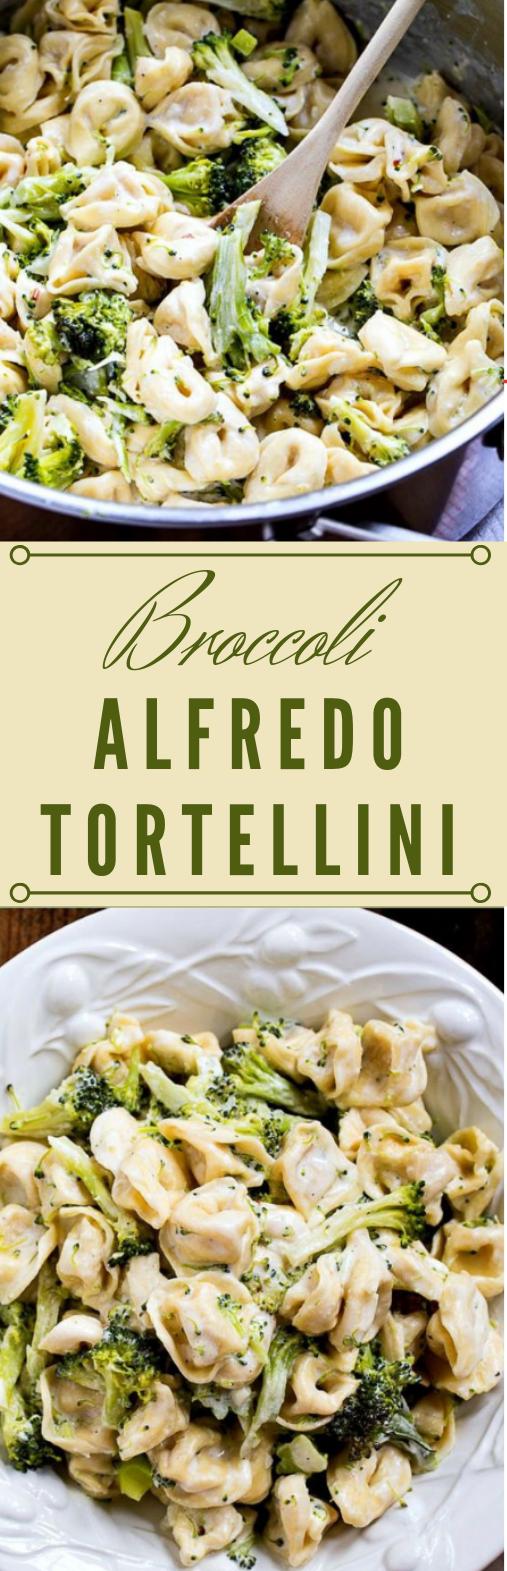 Broccoli Alfredo Tortellini #broccoli #vegan #vegetarian #tortellini #breakfast